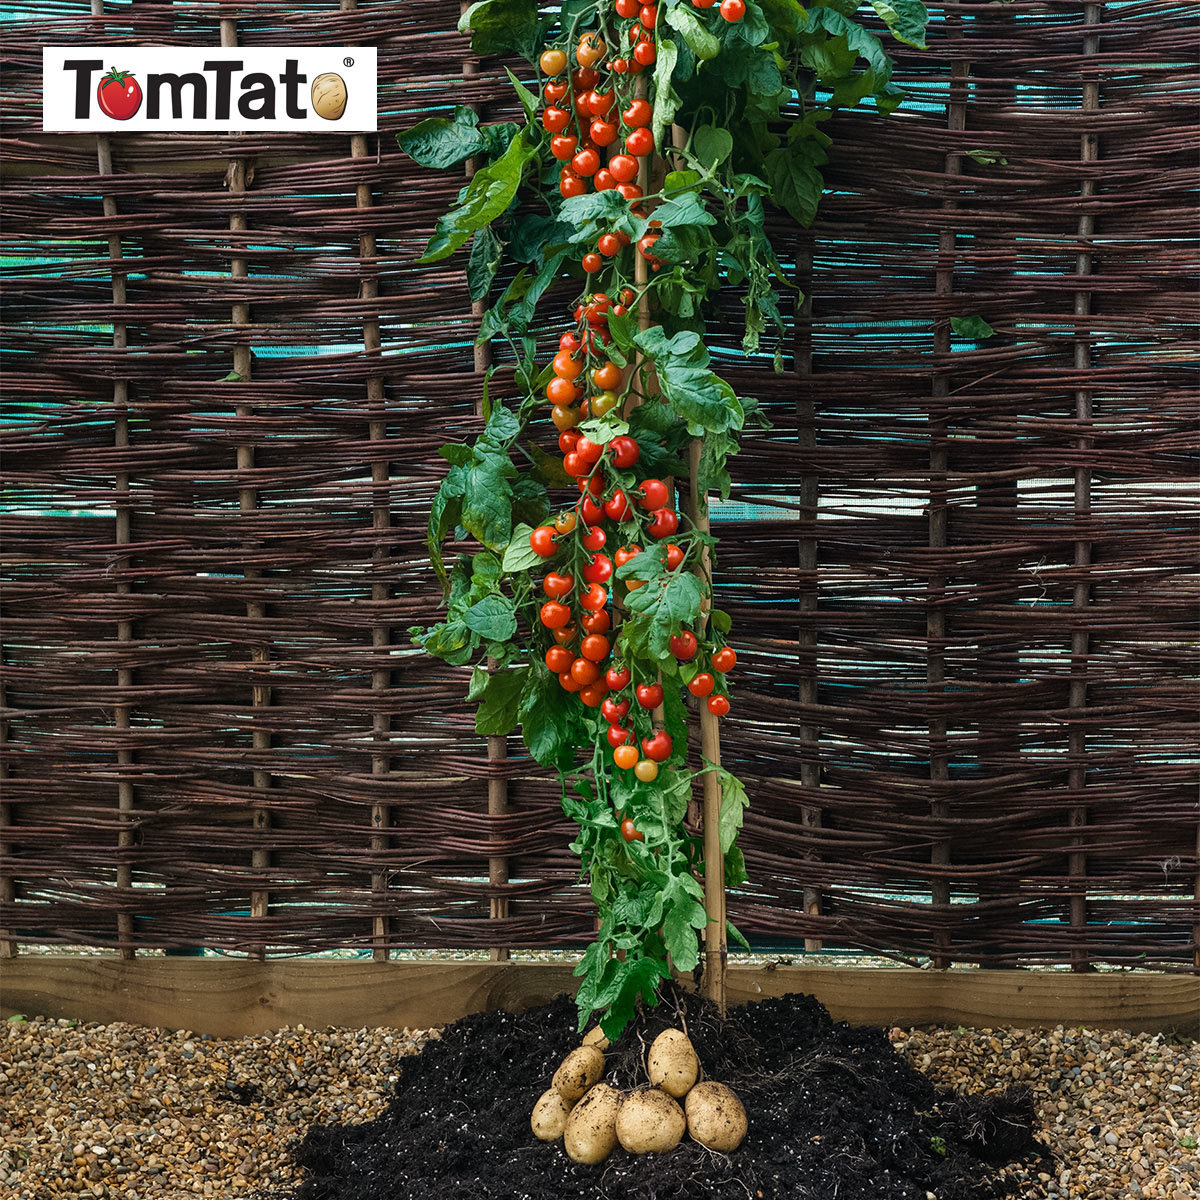 Gemüse-Pflanze TomTato, veredelt